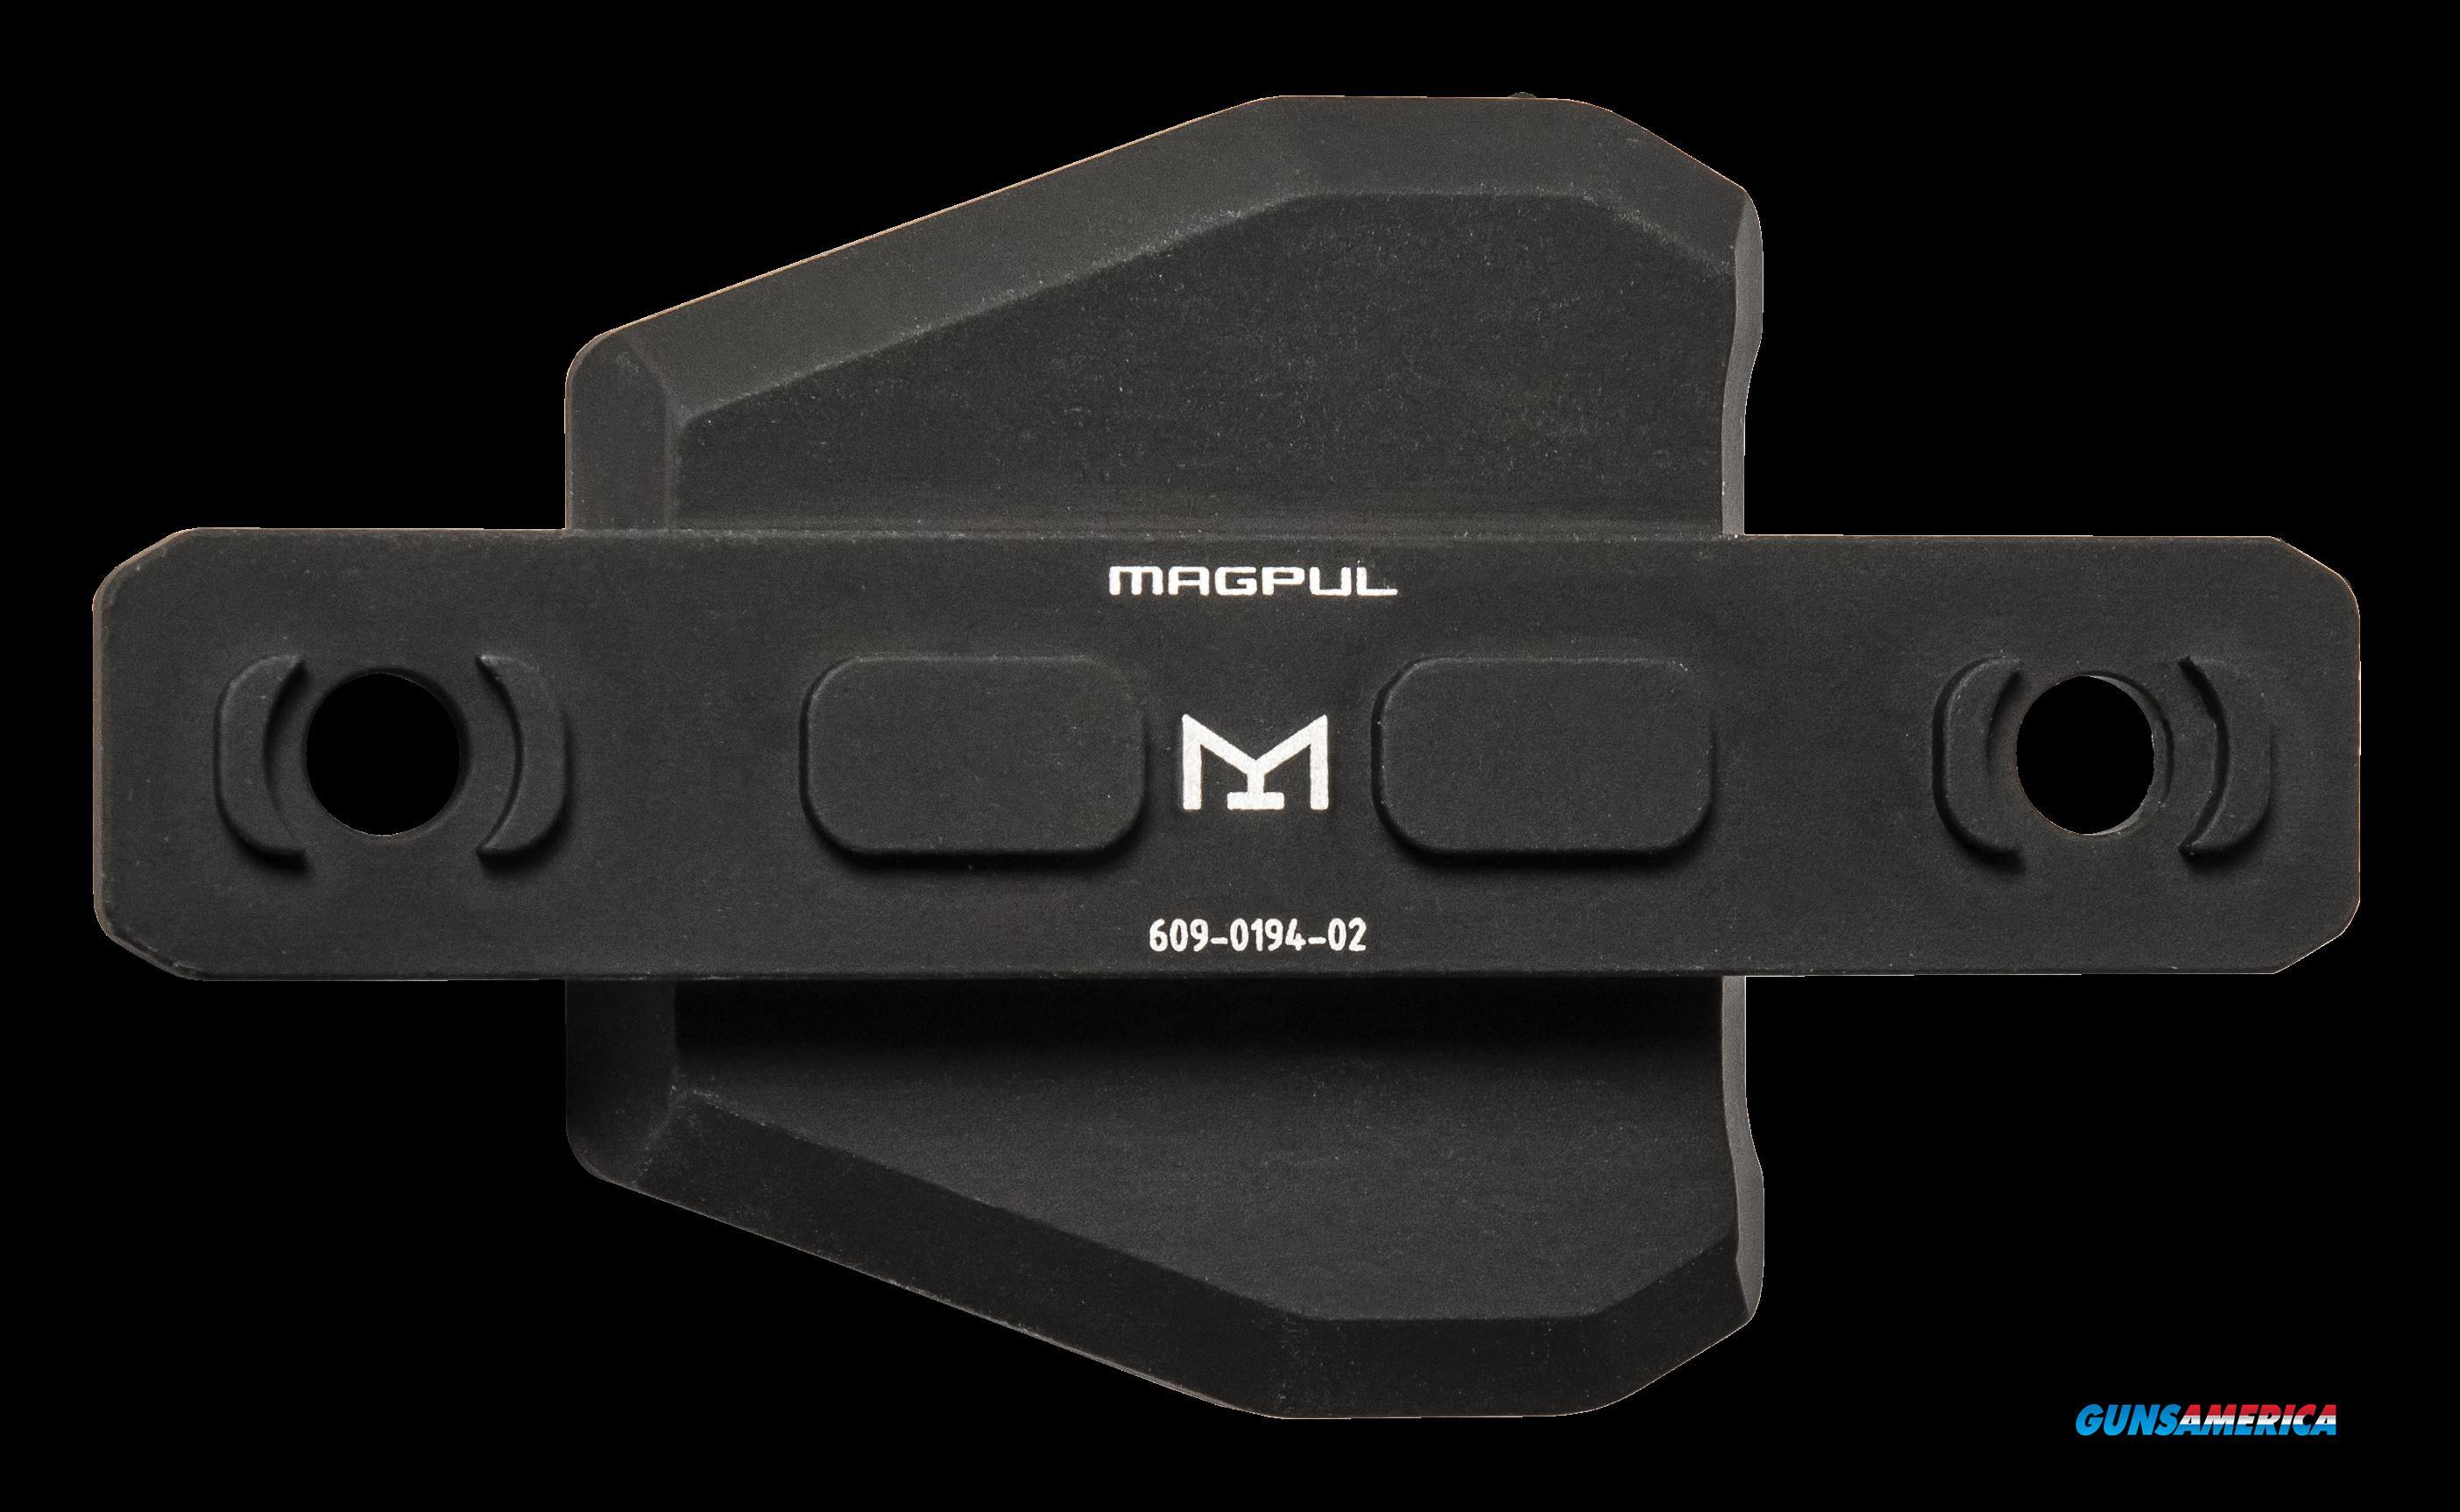 Magpul Industries Corp M-lok Tripod Adapter, Magpul Mag624-blk M-lok Tripod Adapter  Guns > Pistols > 1911 Pistol Copies (non-Colt)